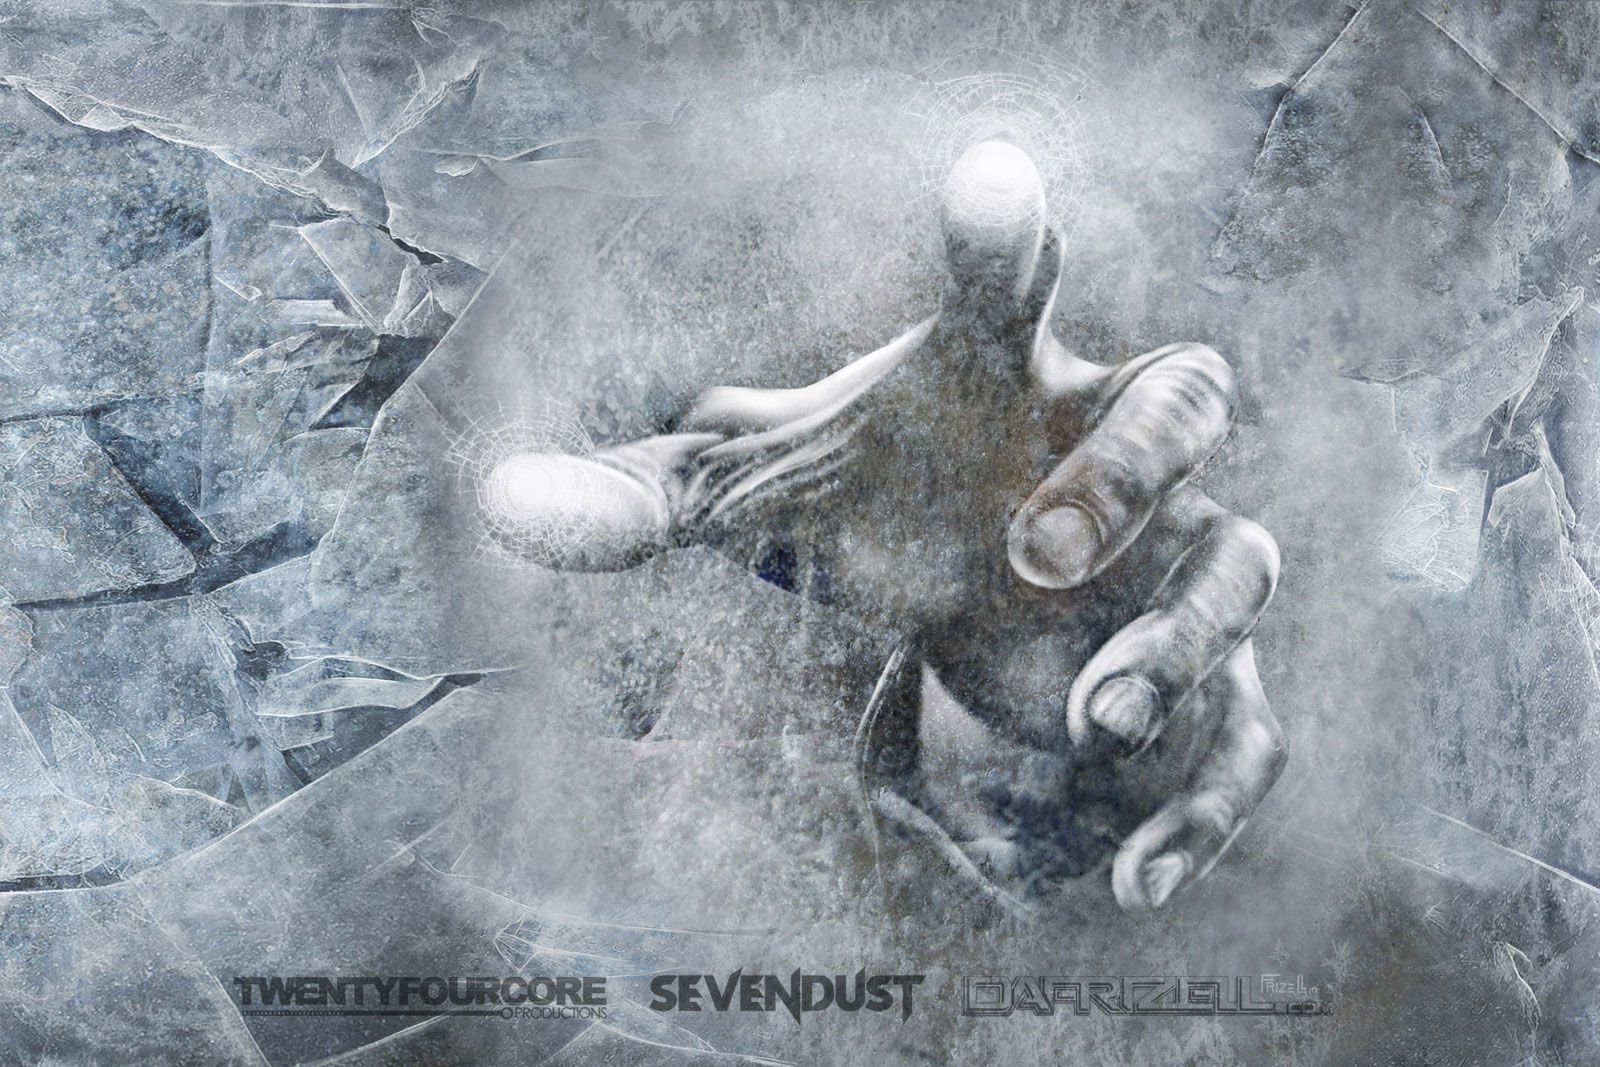 DA Frizell - Hubs art from Sevendust's Cold Day Memory albumn.